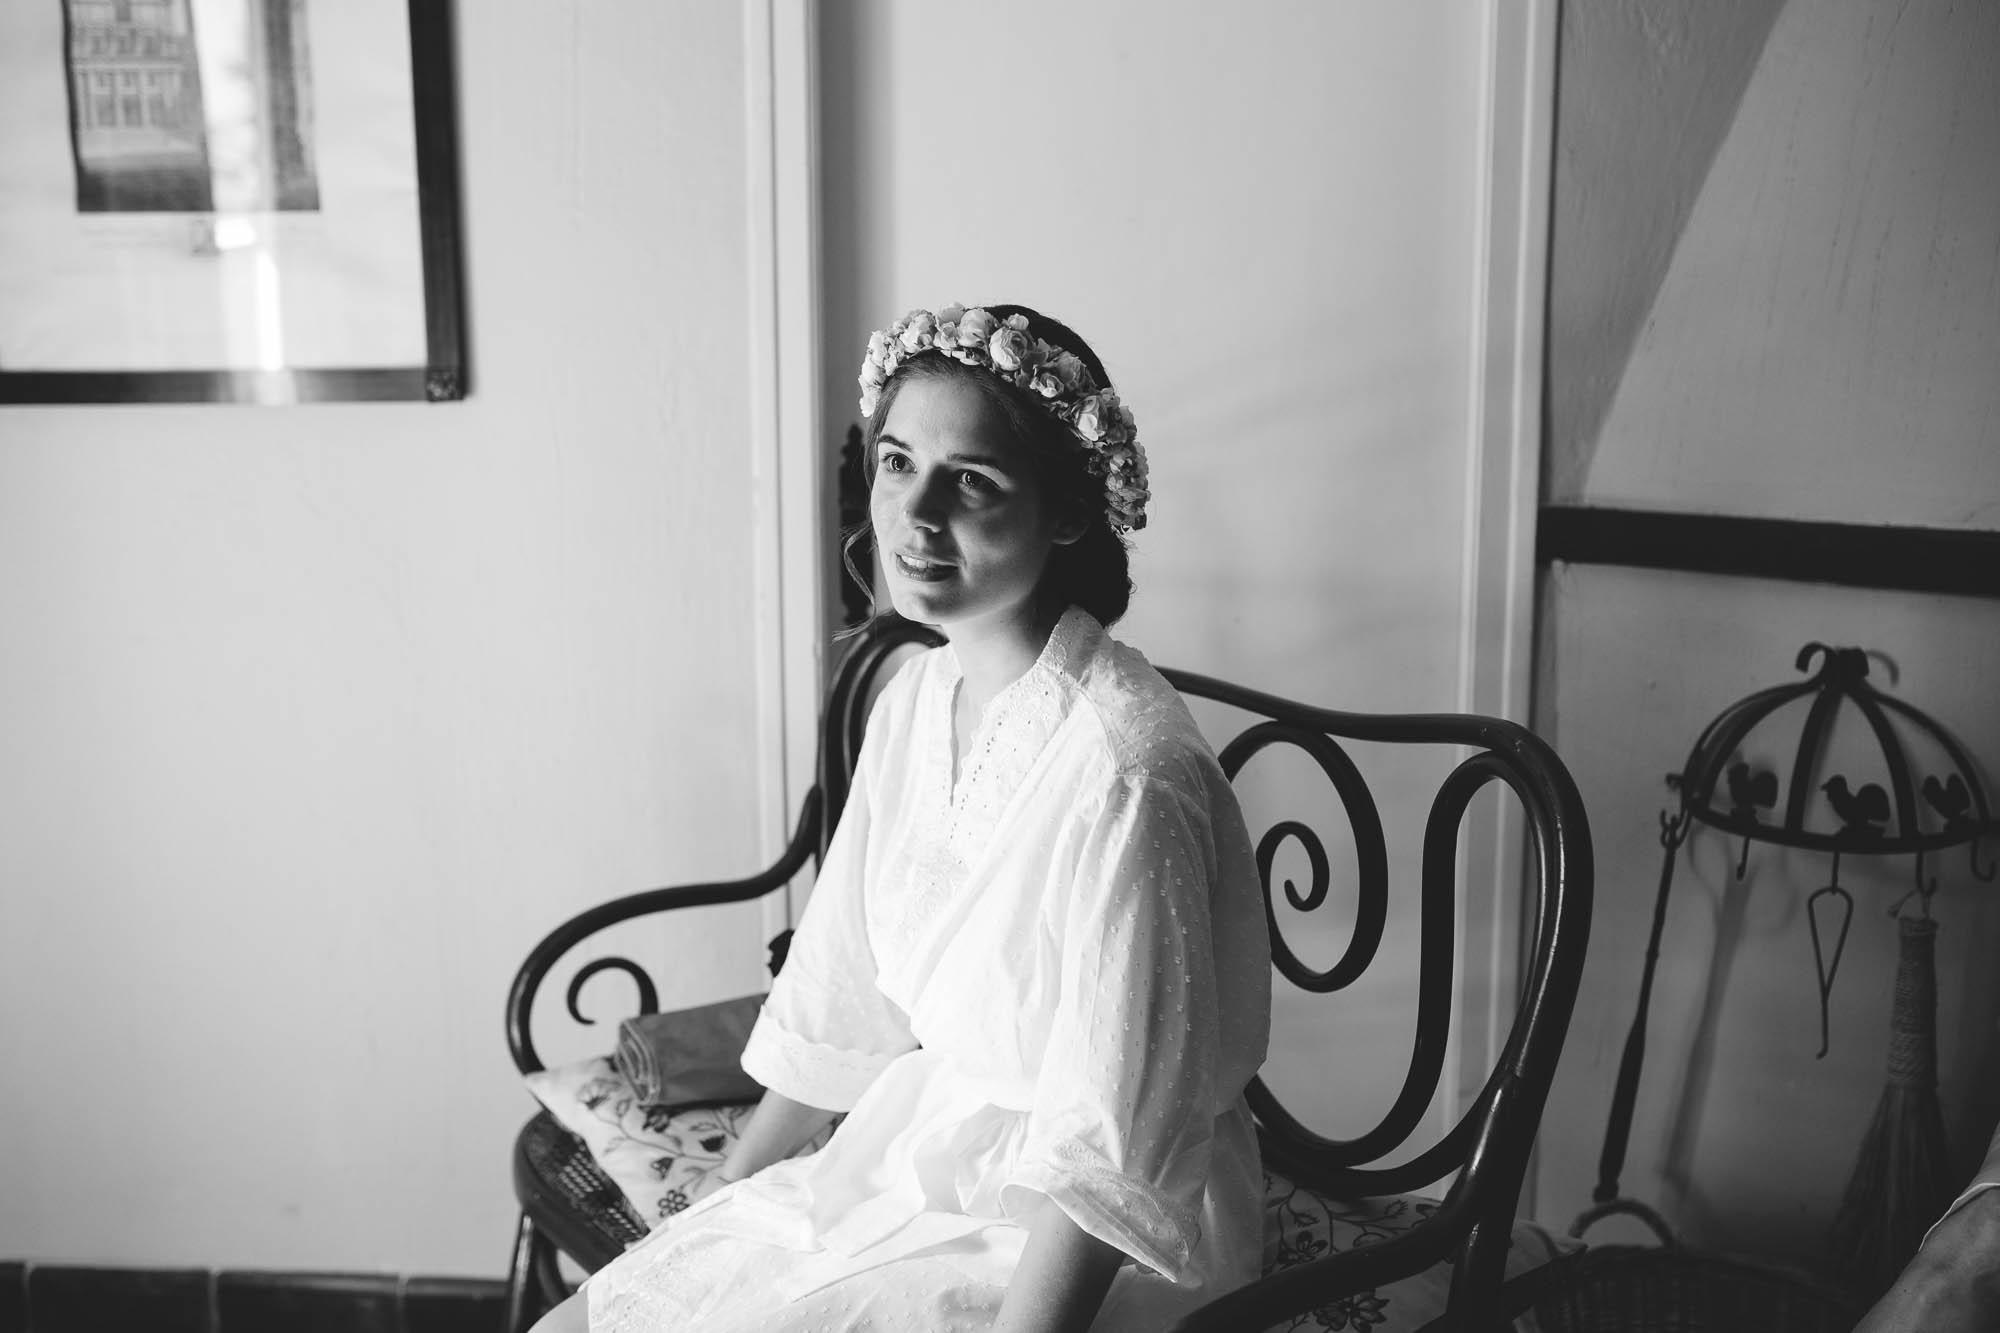 La novia sentada esperando durante los preparativos